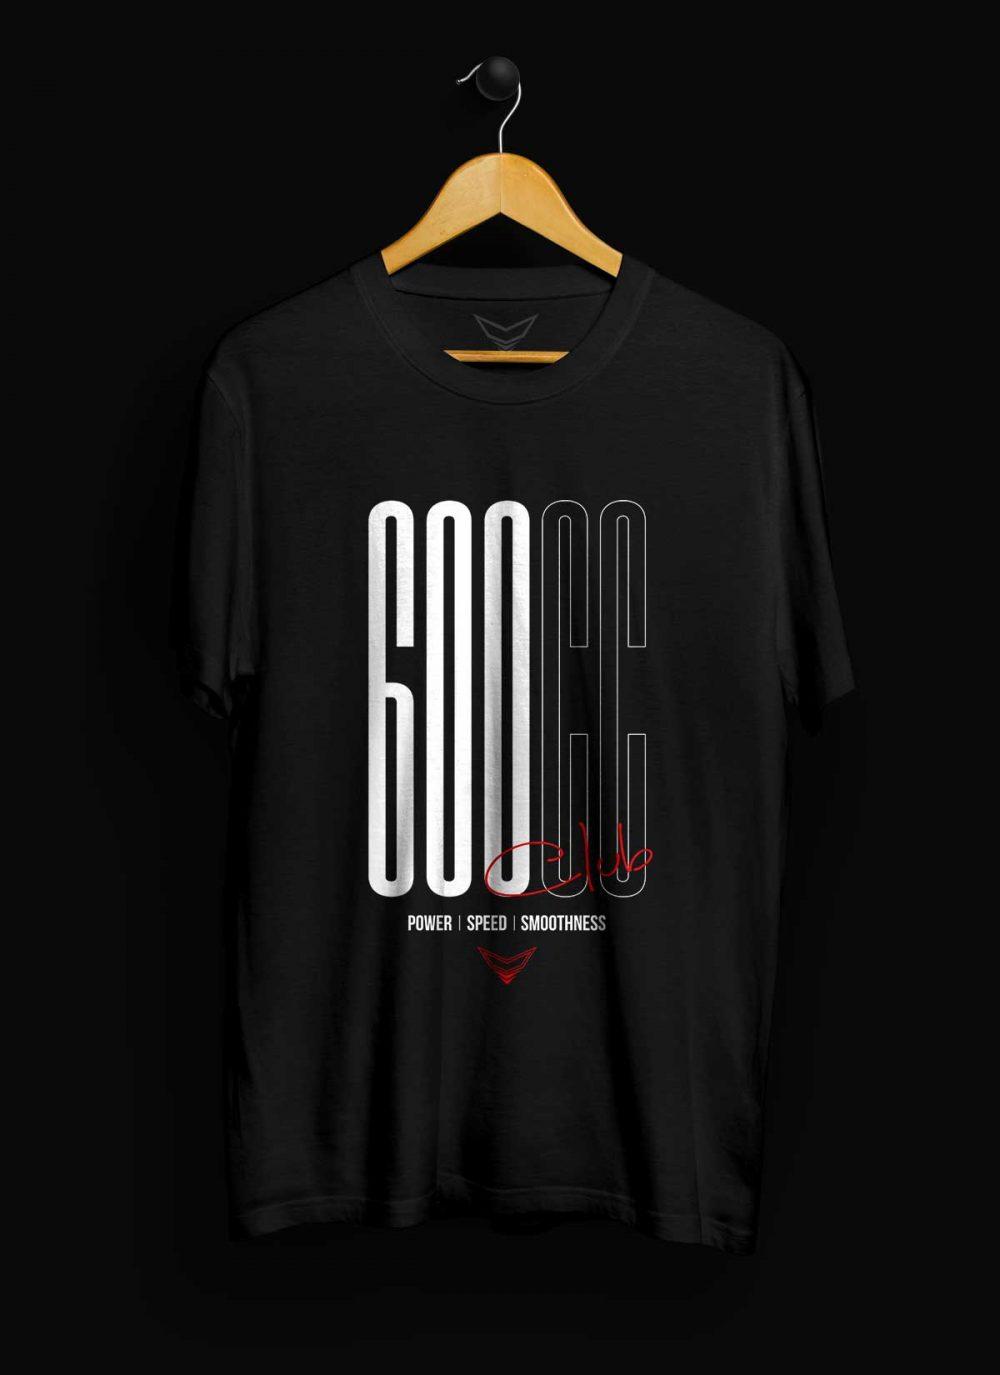 600cc Club T-Shirt